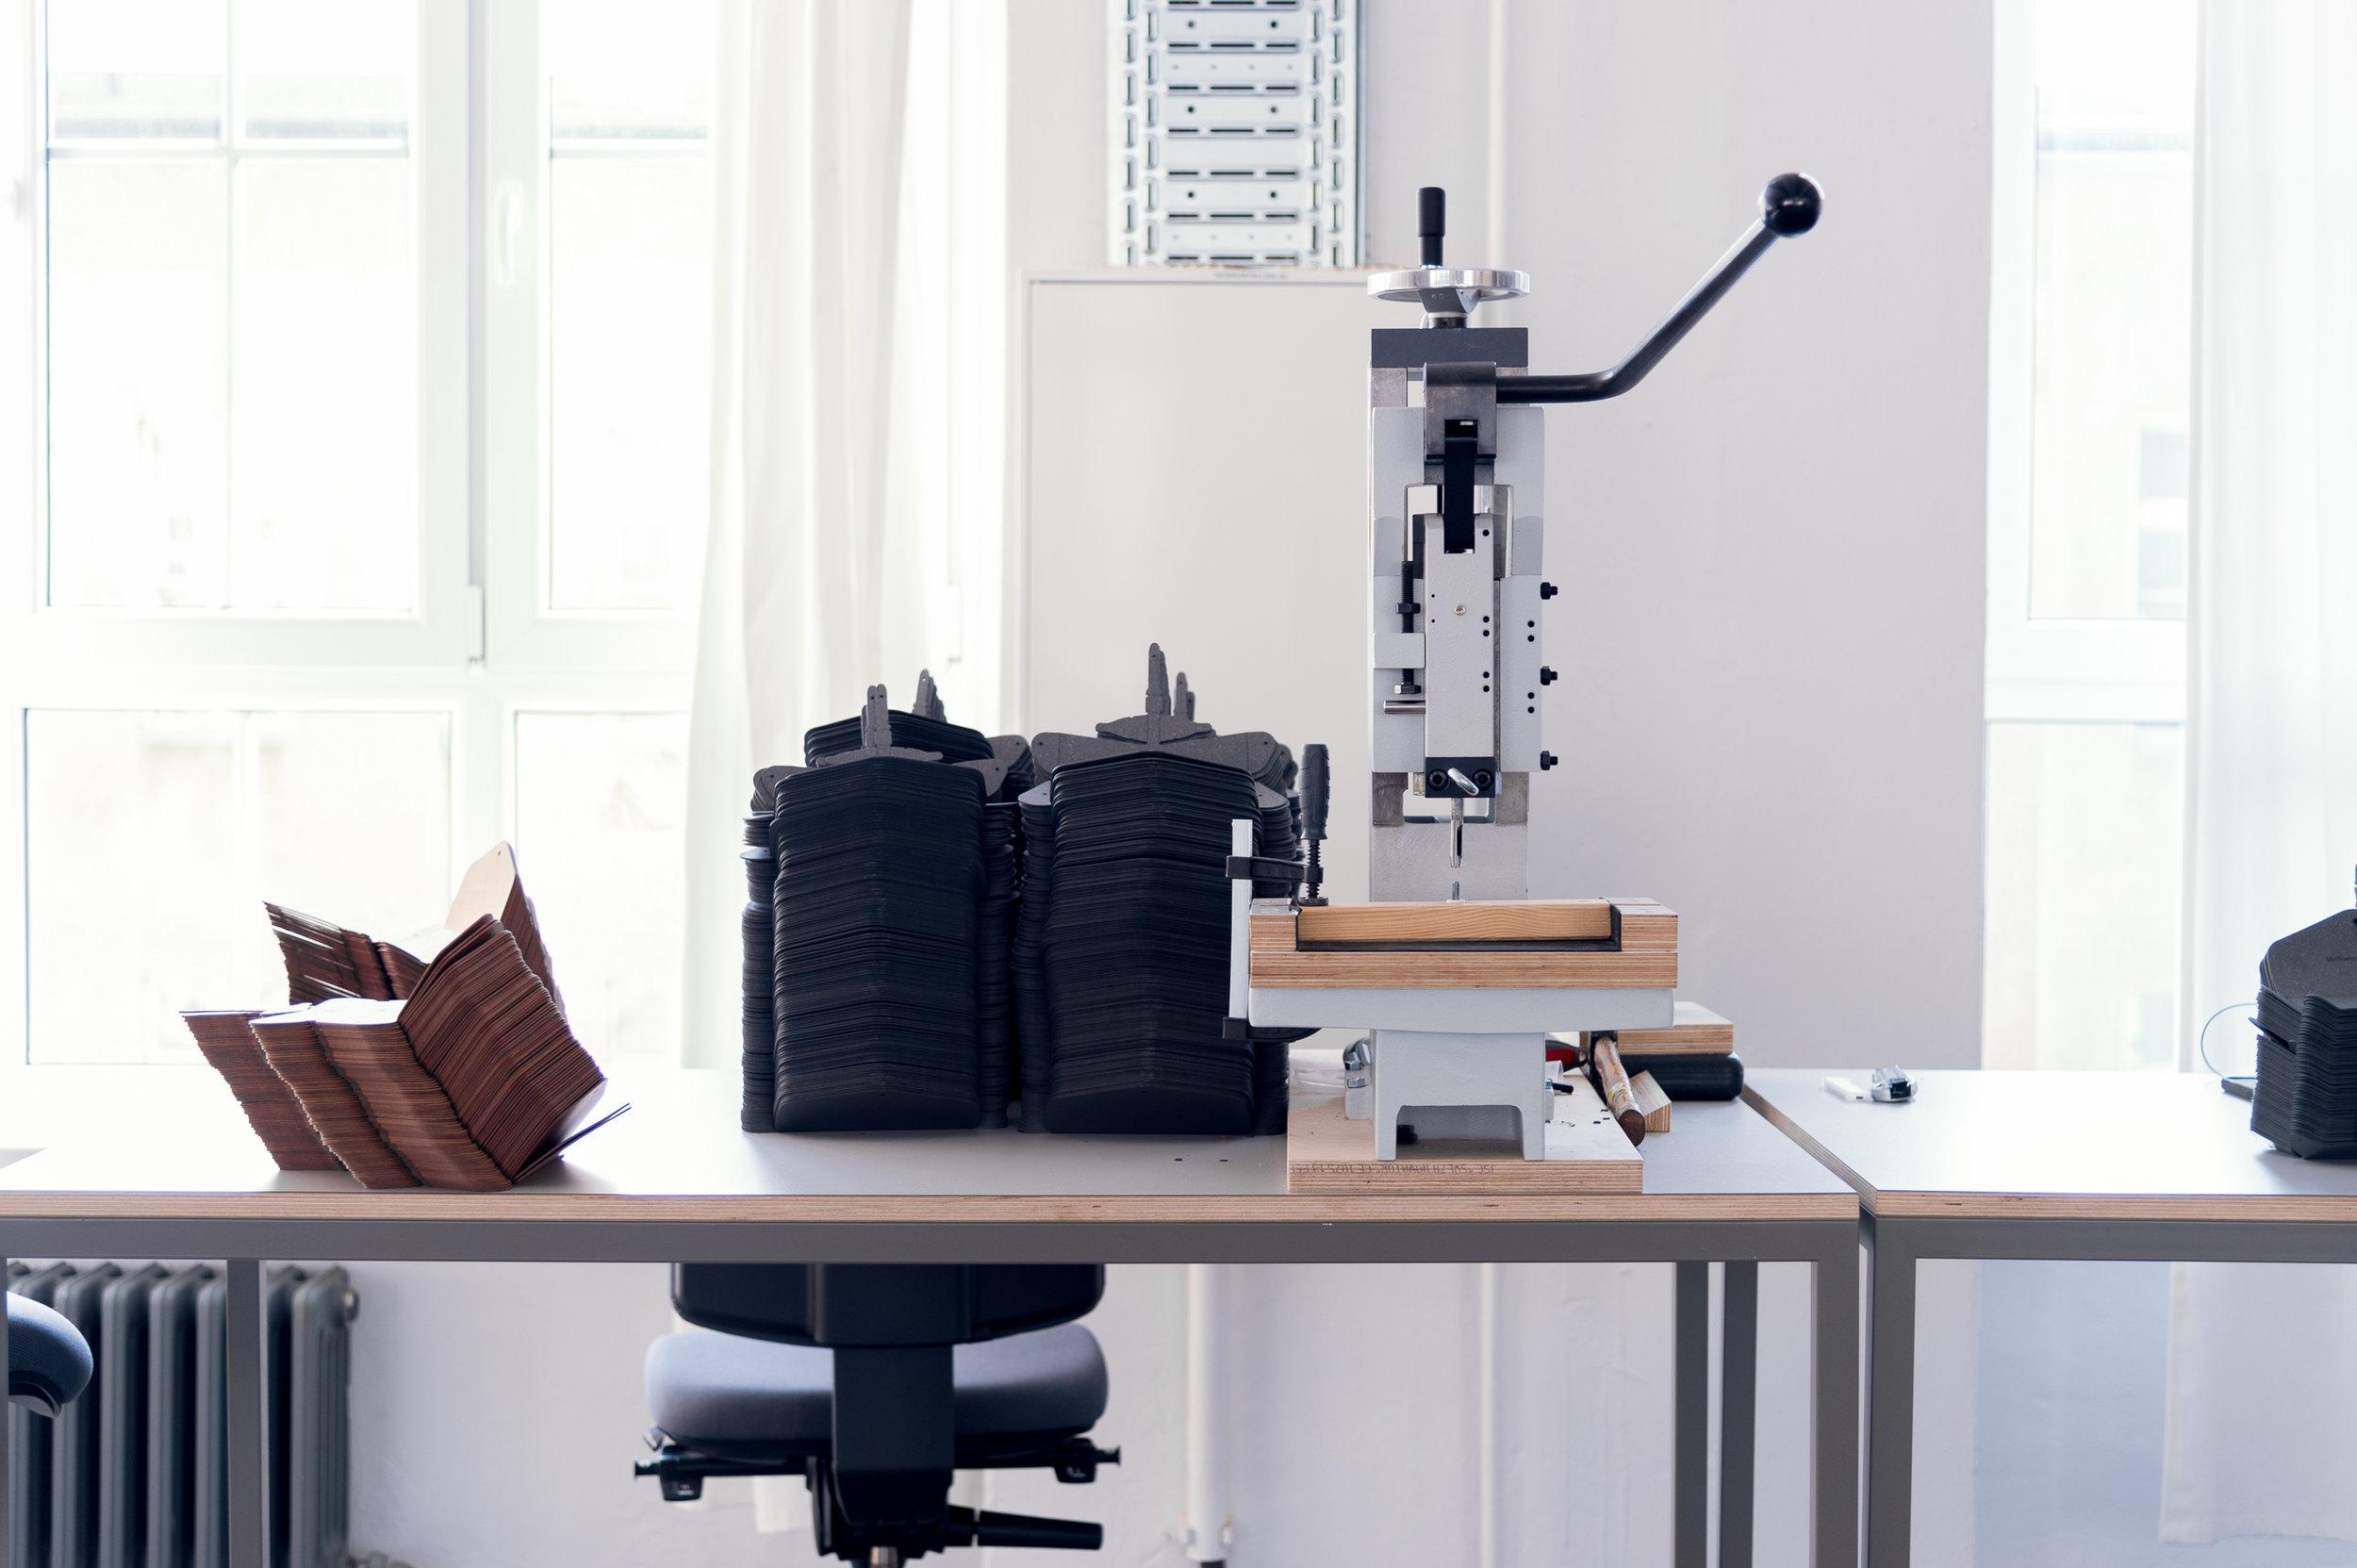 Haffmans Neumeister Eyewear Production Manufactory-3839.jpg